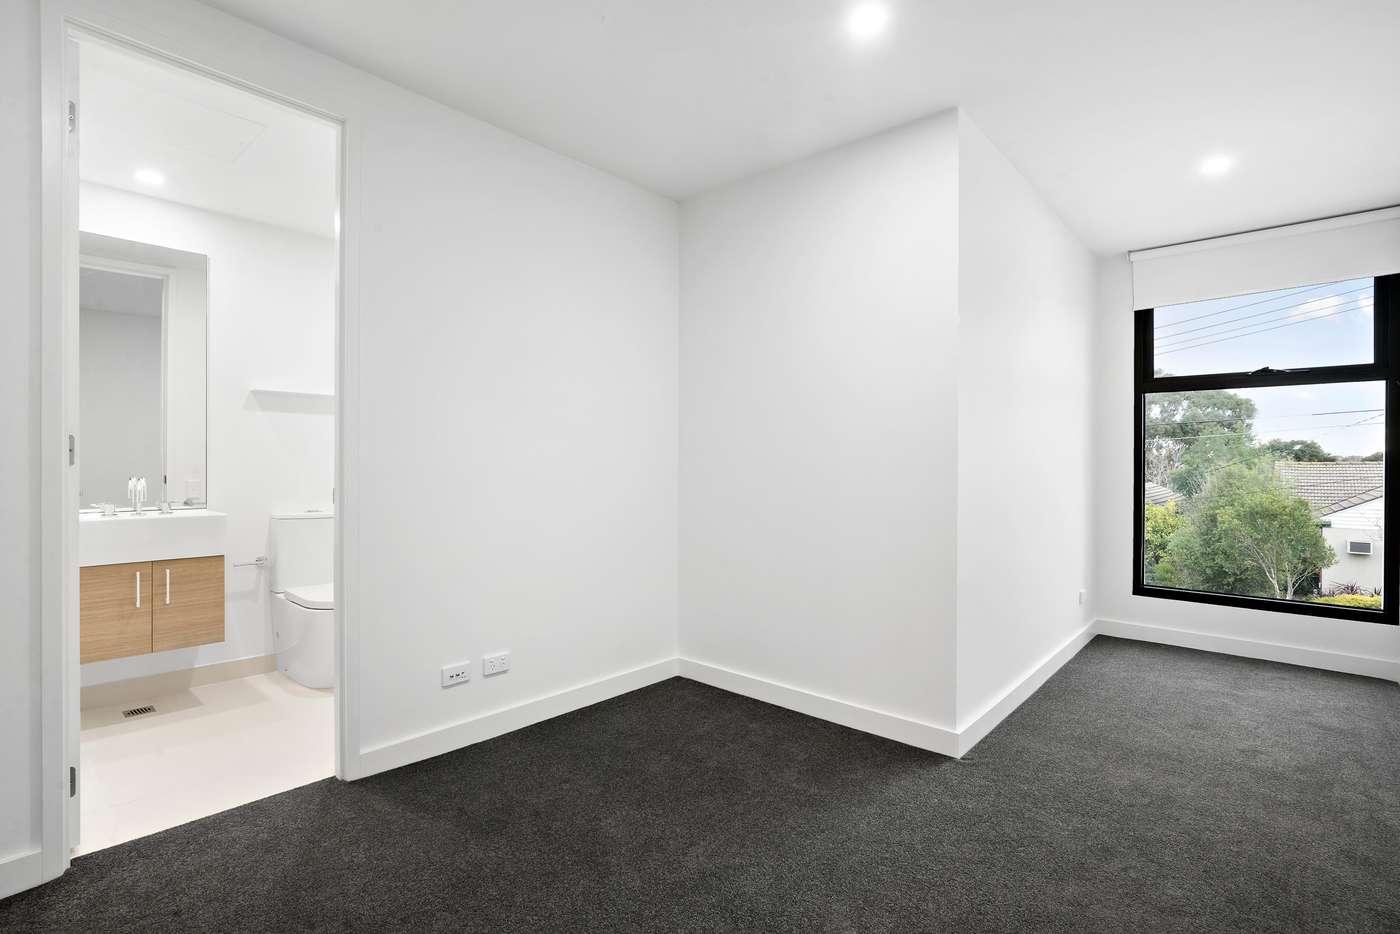 Sixth view of Homely apartment listing, 102/10 Major Street, Highett VIC 3190